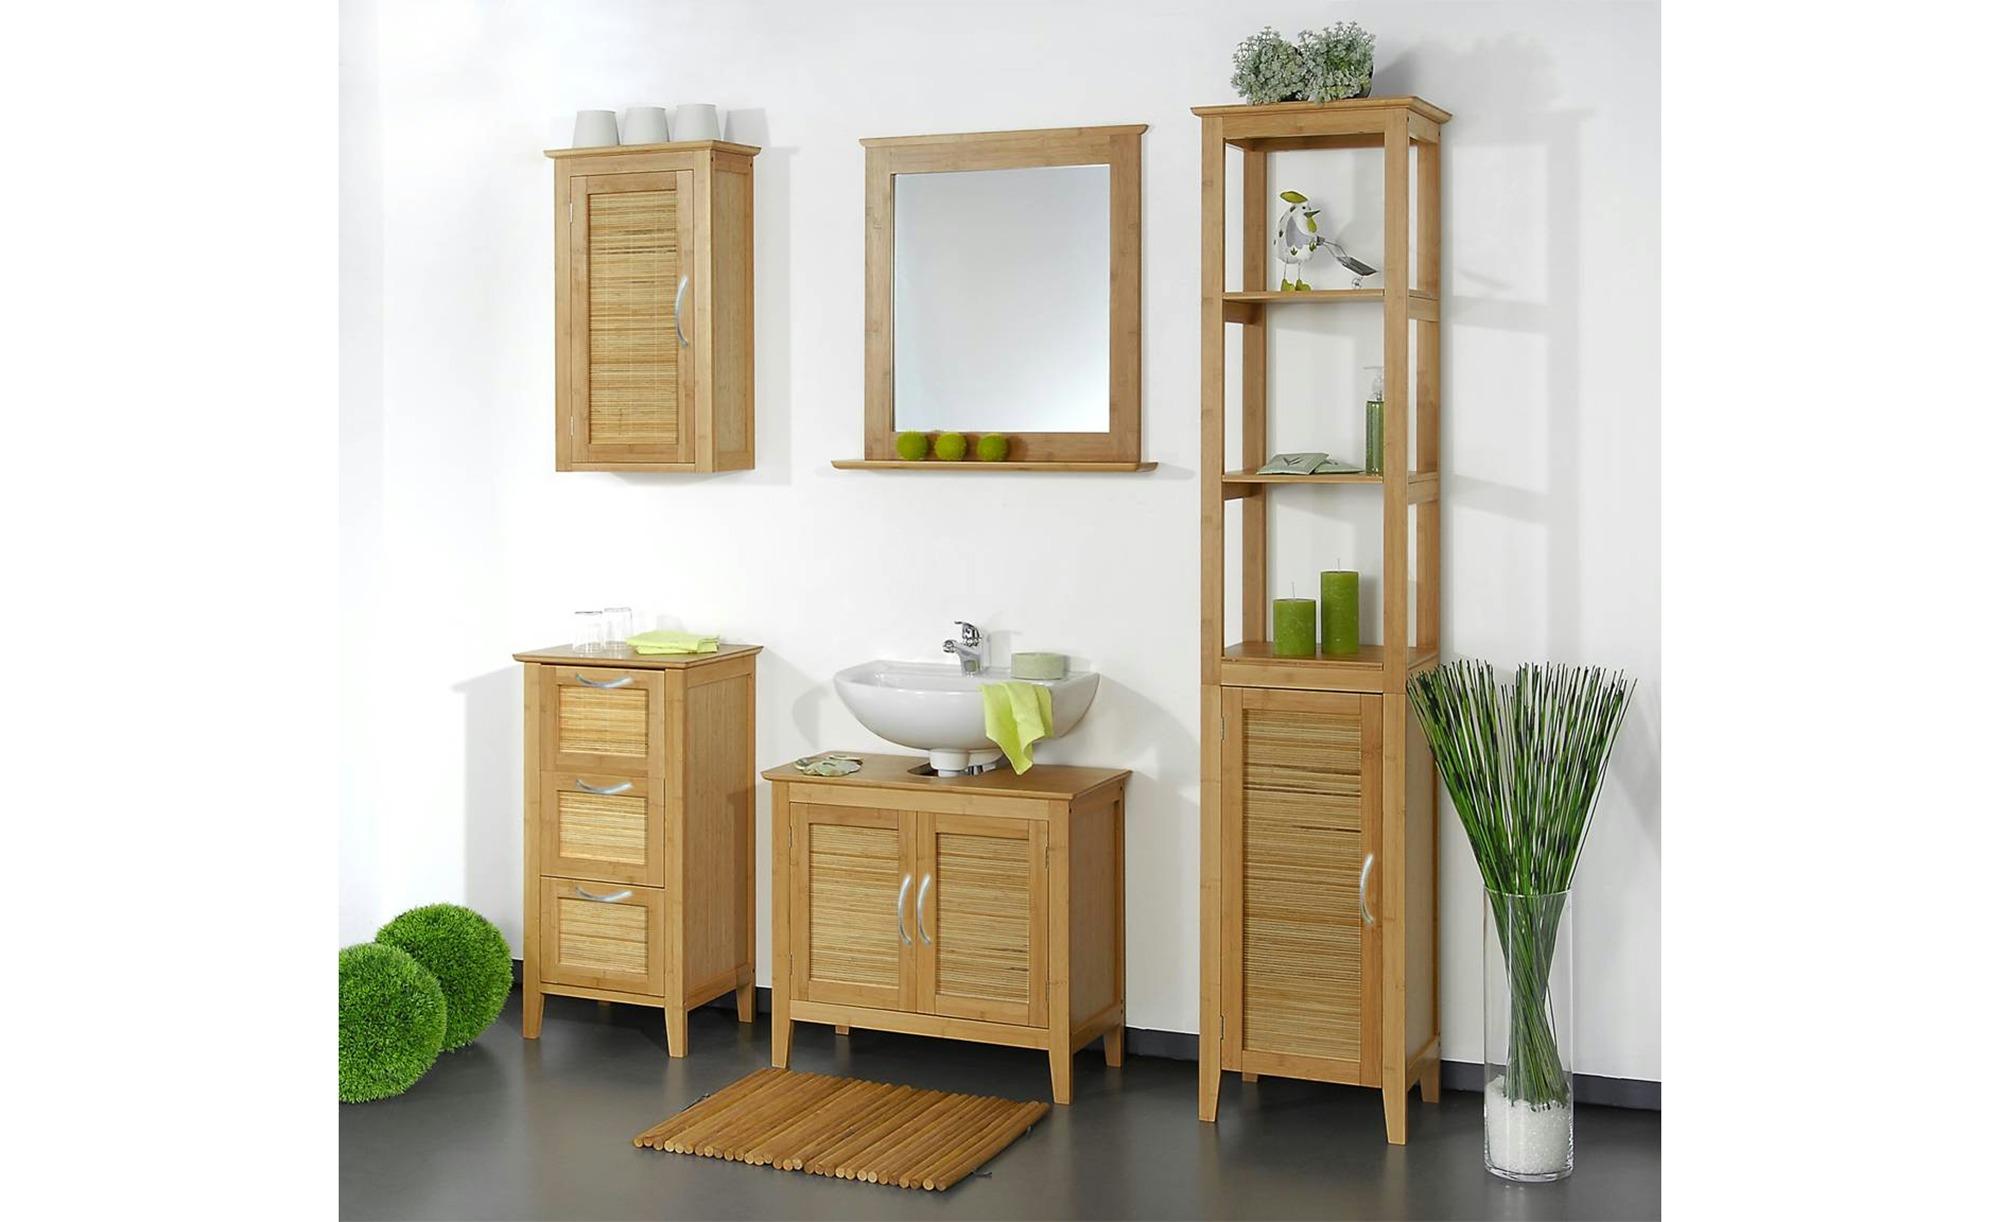 Badezimmereinrichtung 'Bamboo'